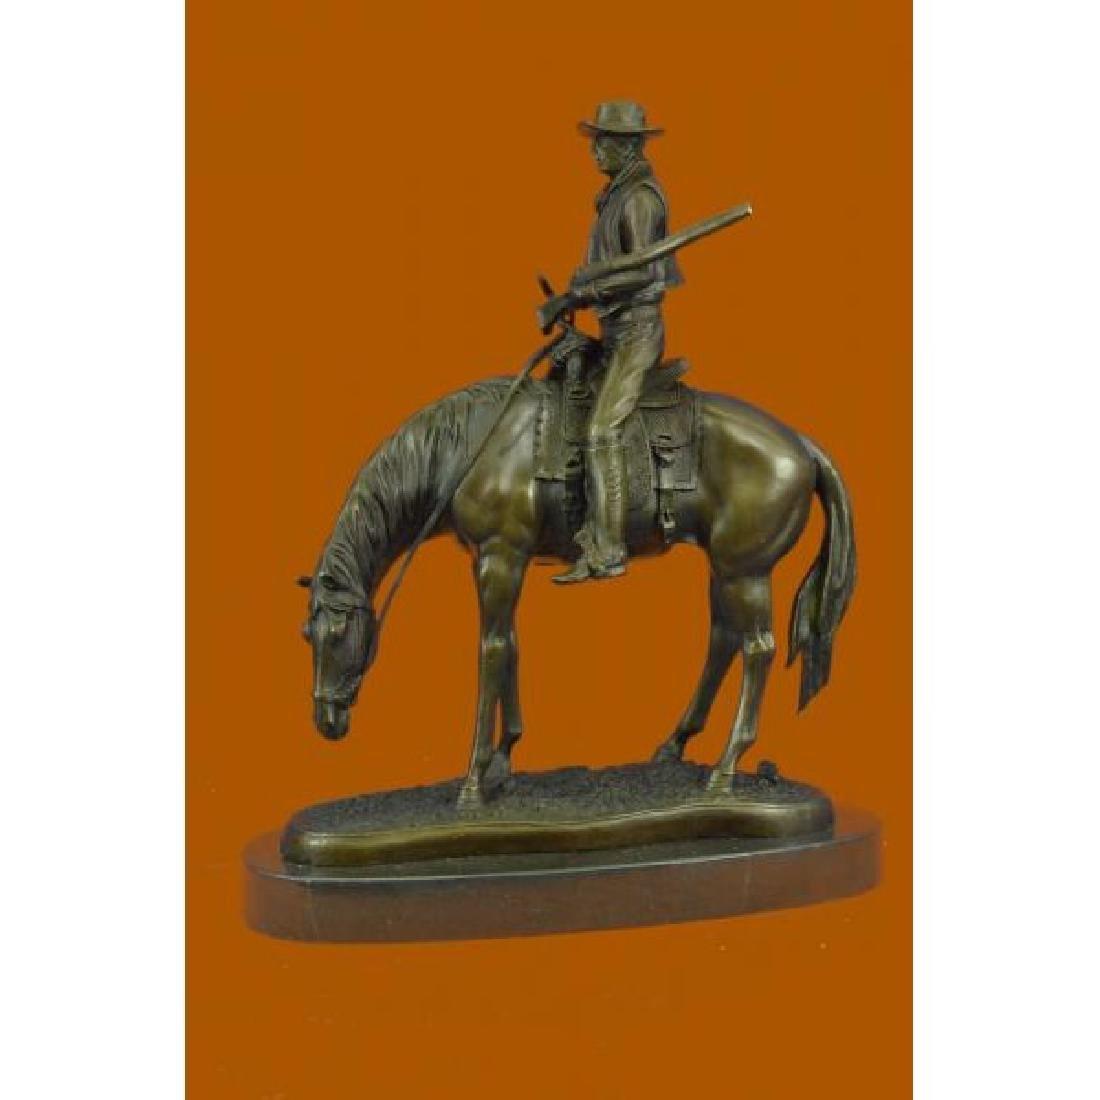 Western Cowboy Bronze Sculpture Horse Large Rodeo Rider